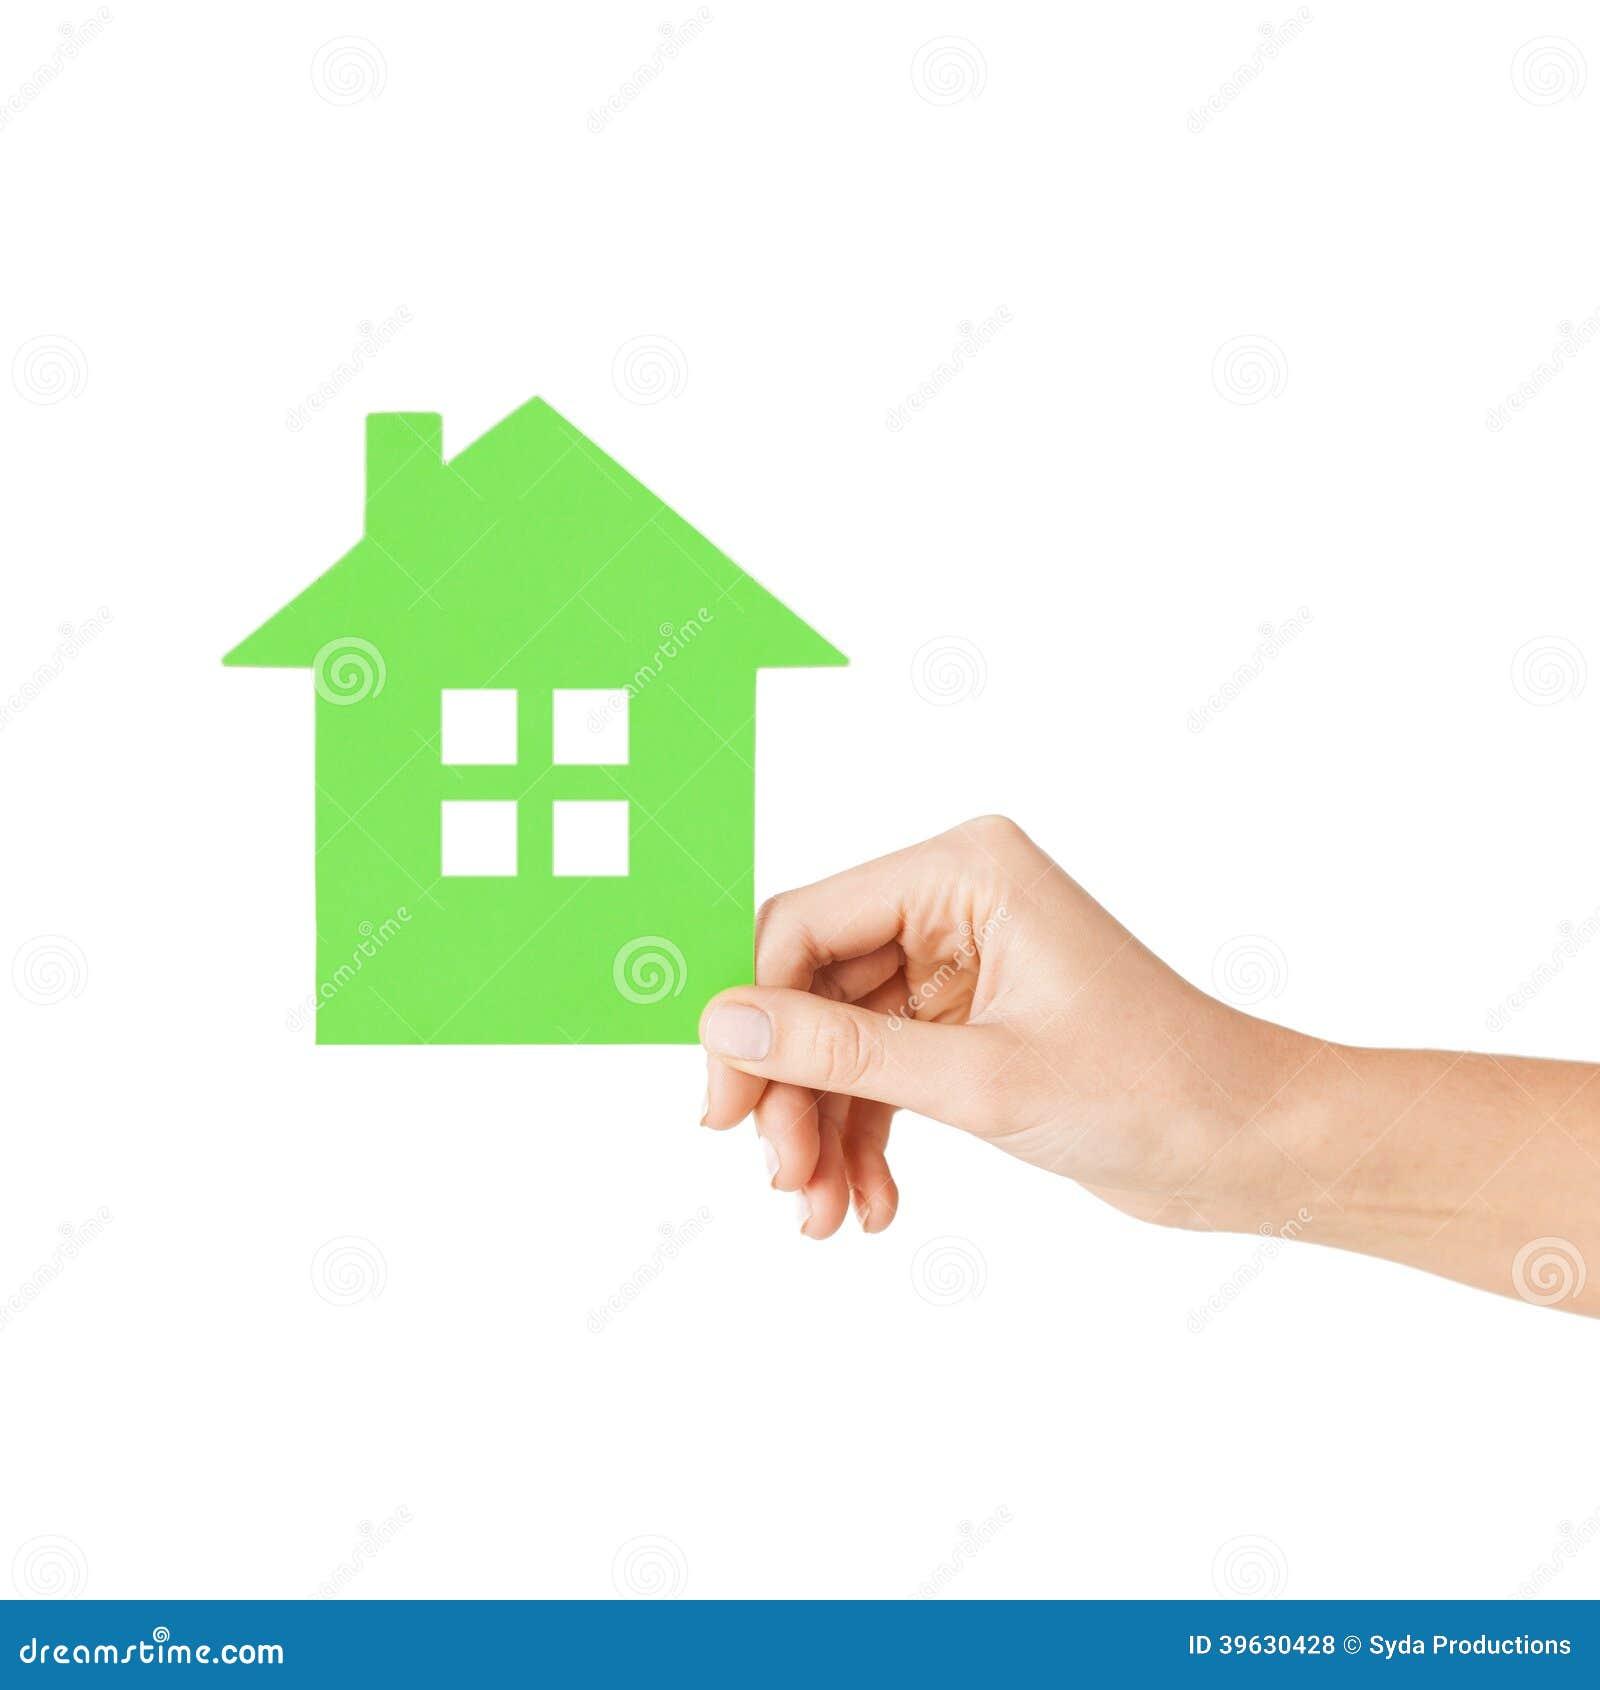 real estate business plan in bangladesh female